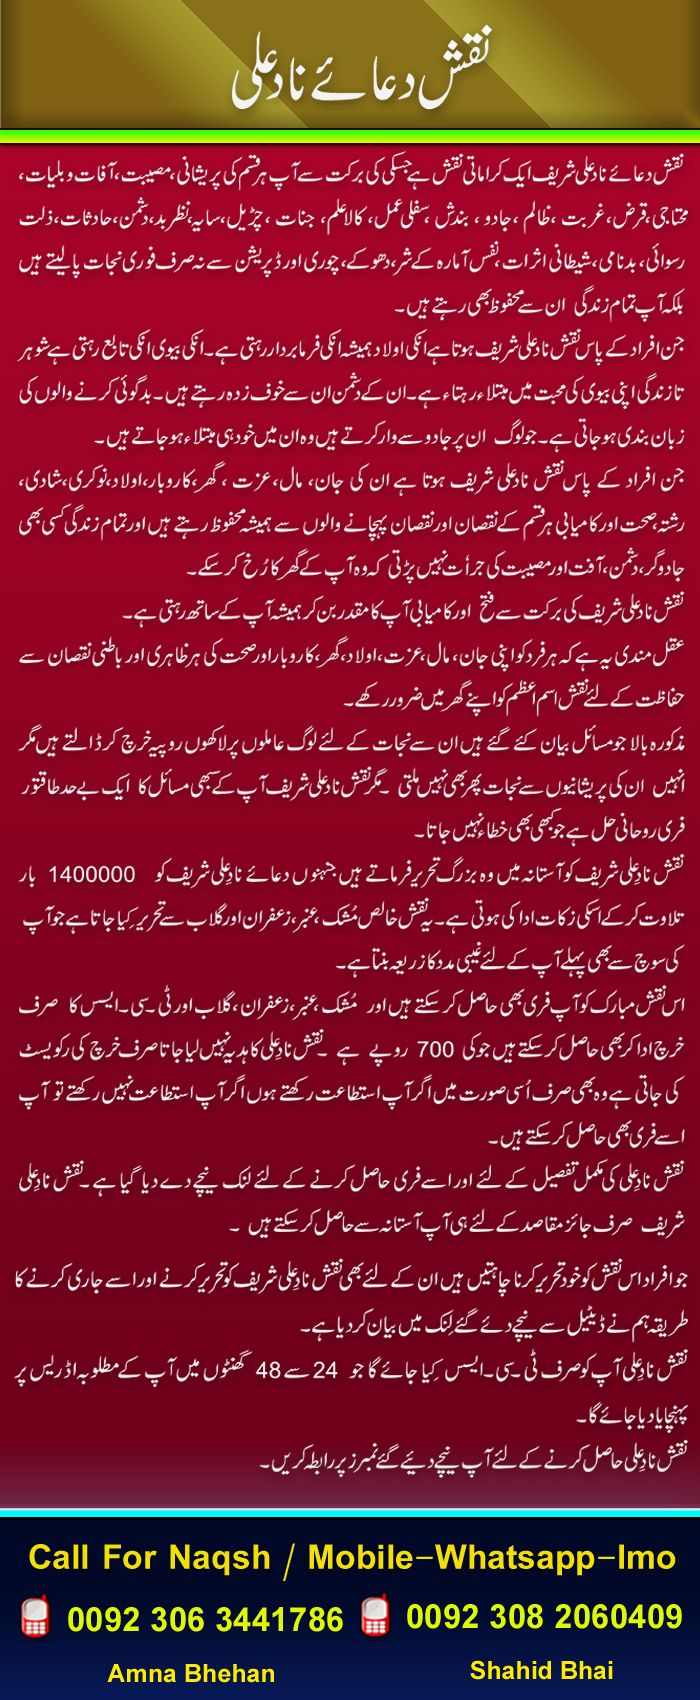 Bukhar Utarne Ki Dua Nad e Ali | Nade Ali For Shifa | Shifa